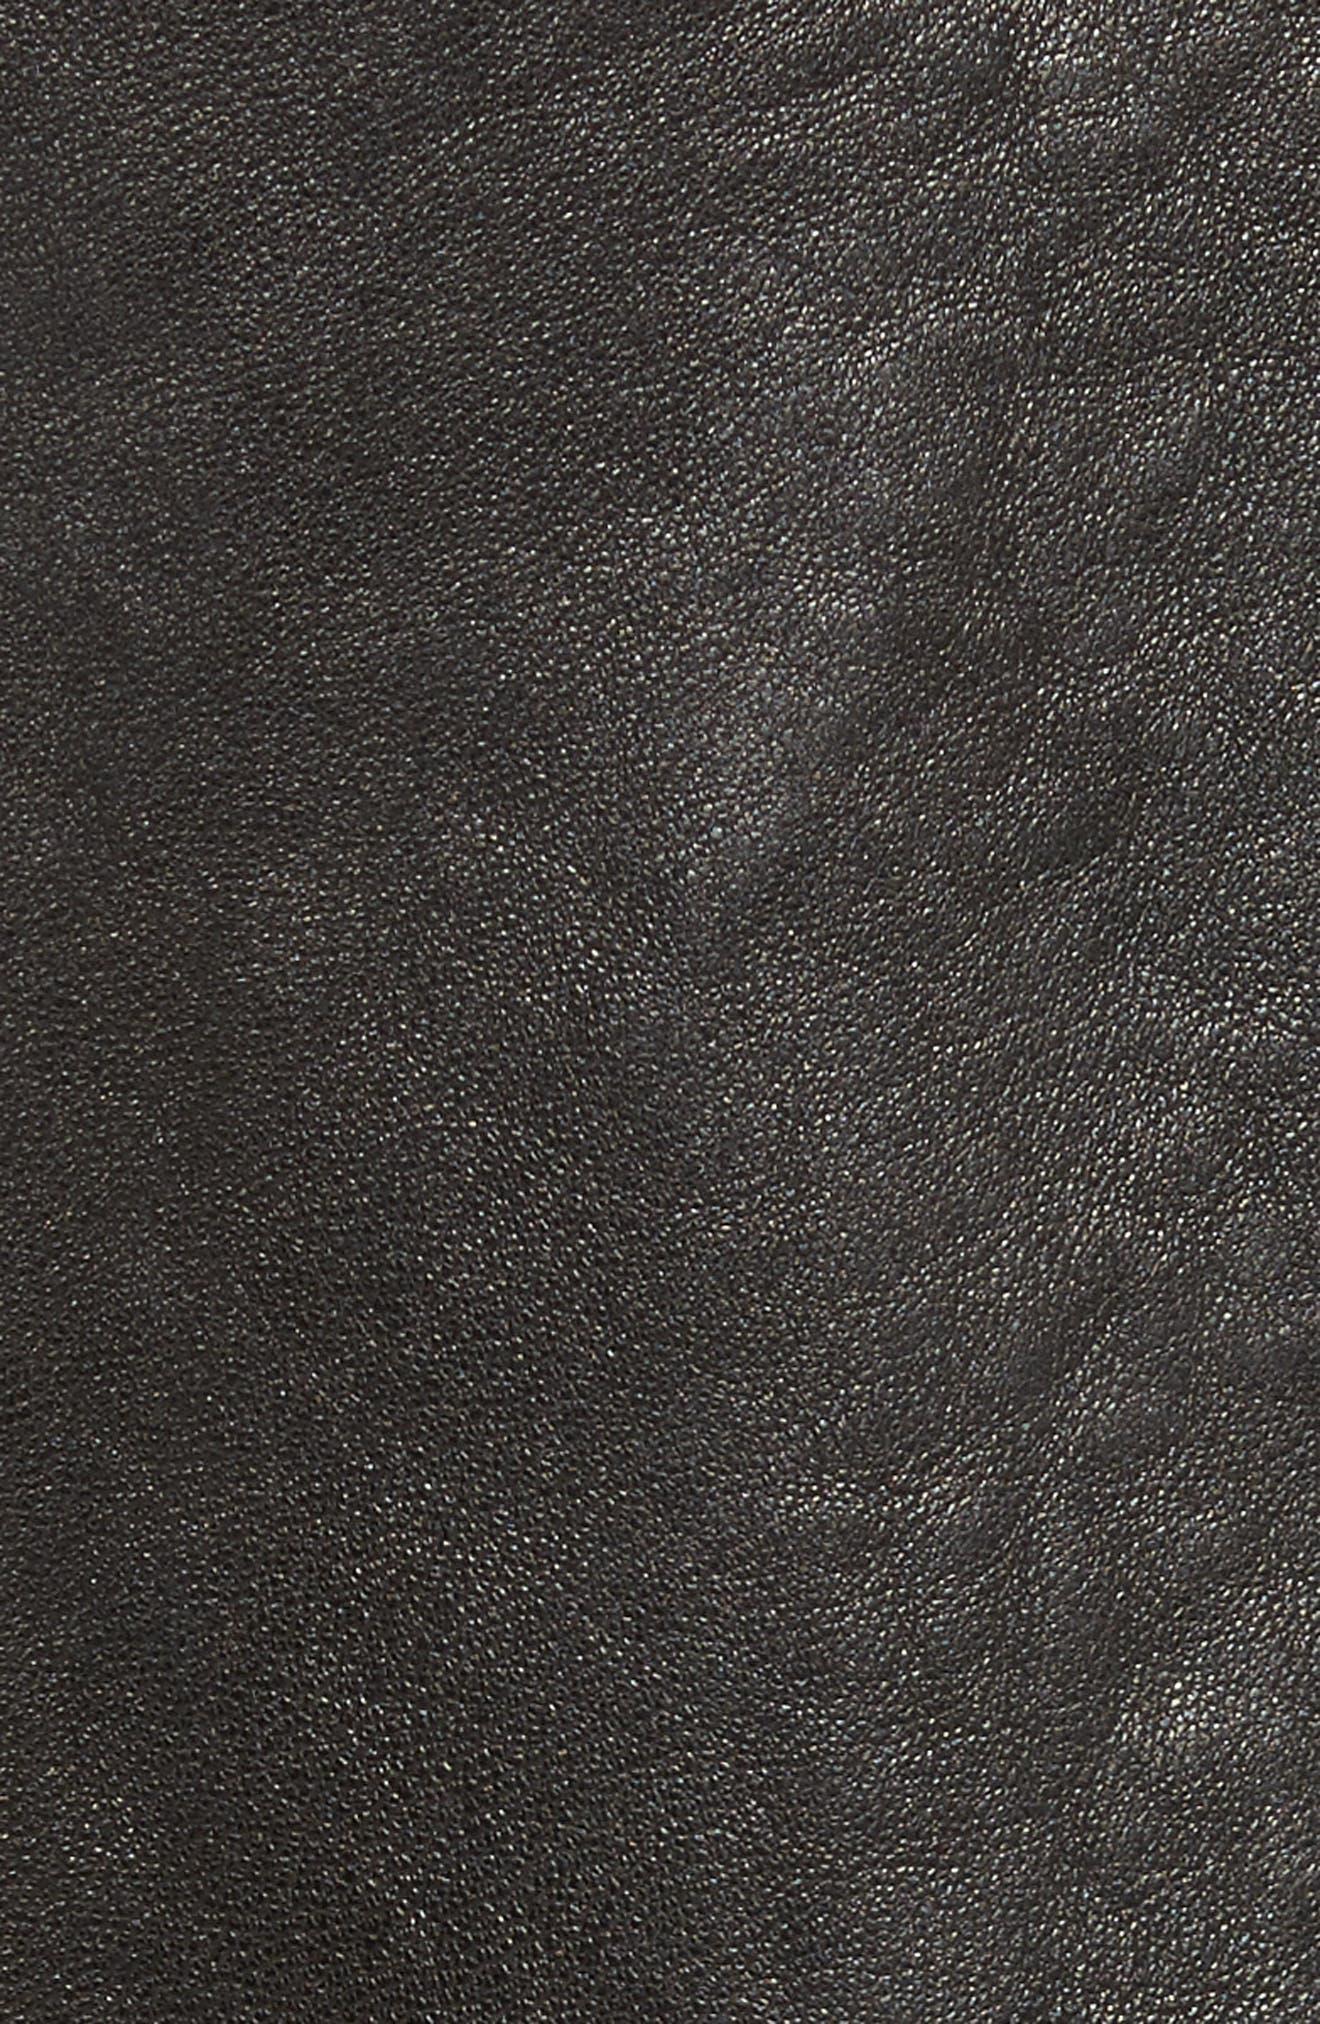 Paneled Leather & Suede Jacket,                             Alternate thumbnail 6, color,